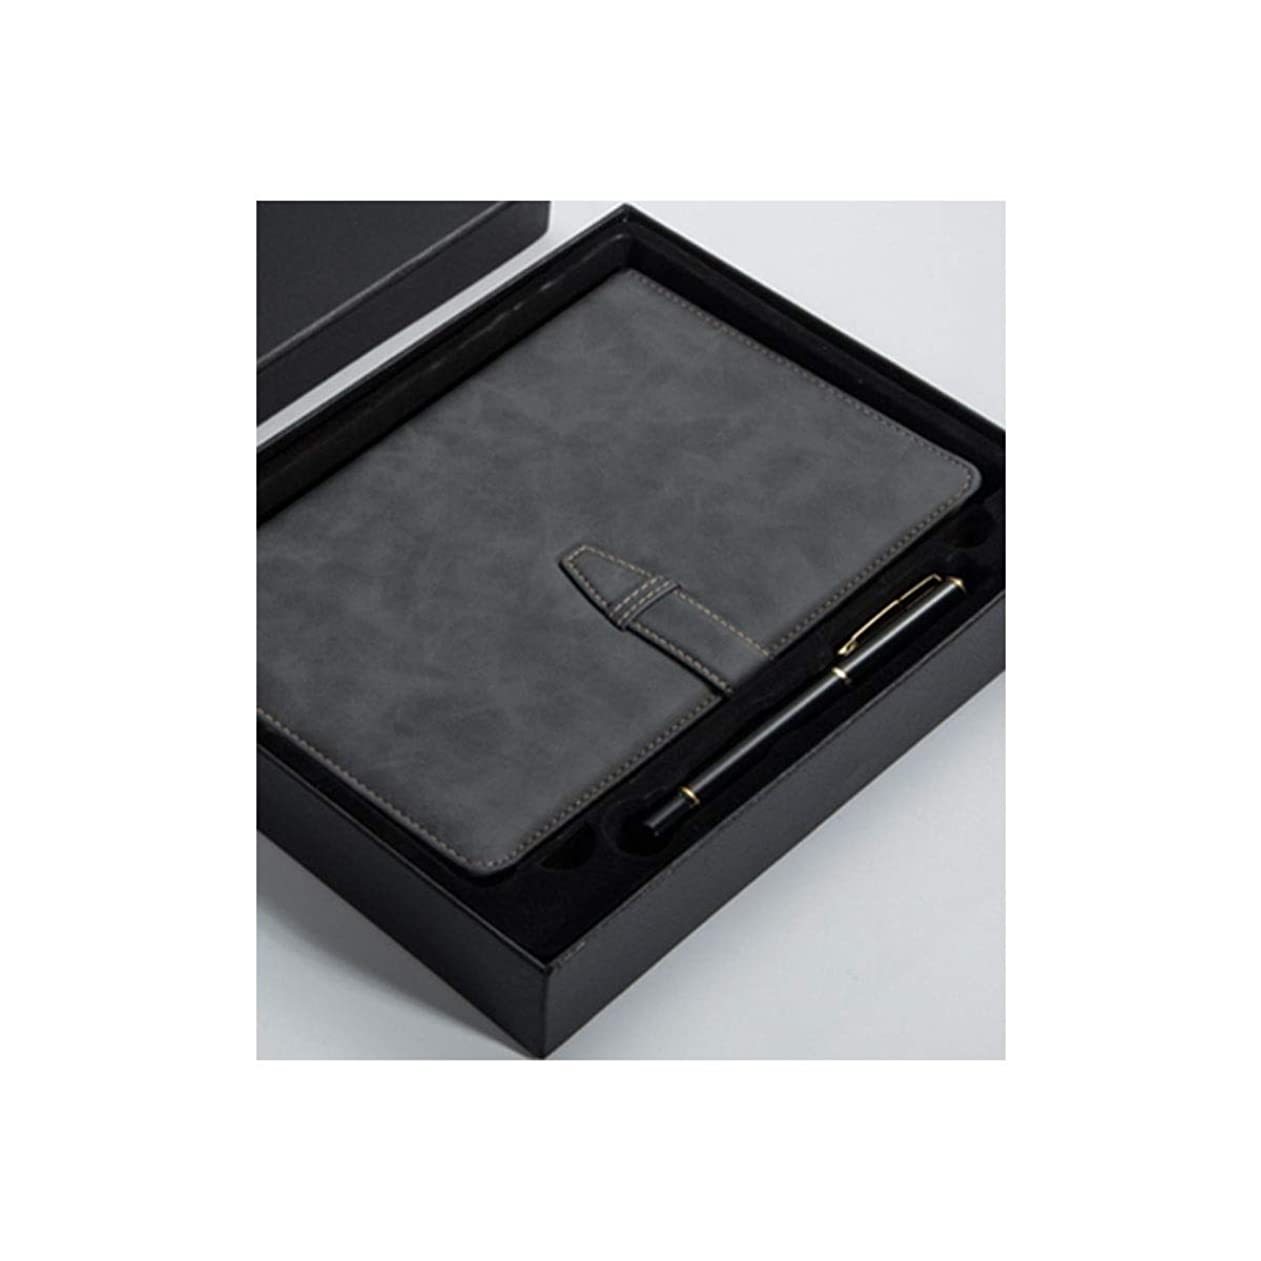 Guyuexuan ギフトノートとペンセットギフトボックス、ノートセット、ホリデーギフト、ノートブック、ビジネス会議仕事メモ帳、複数の色 高品質の製品 4 (Style : A)